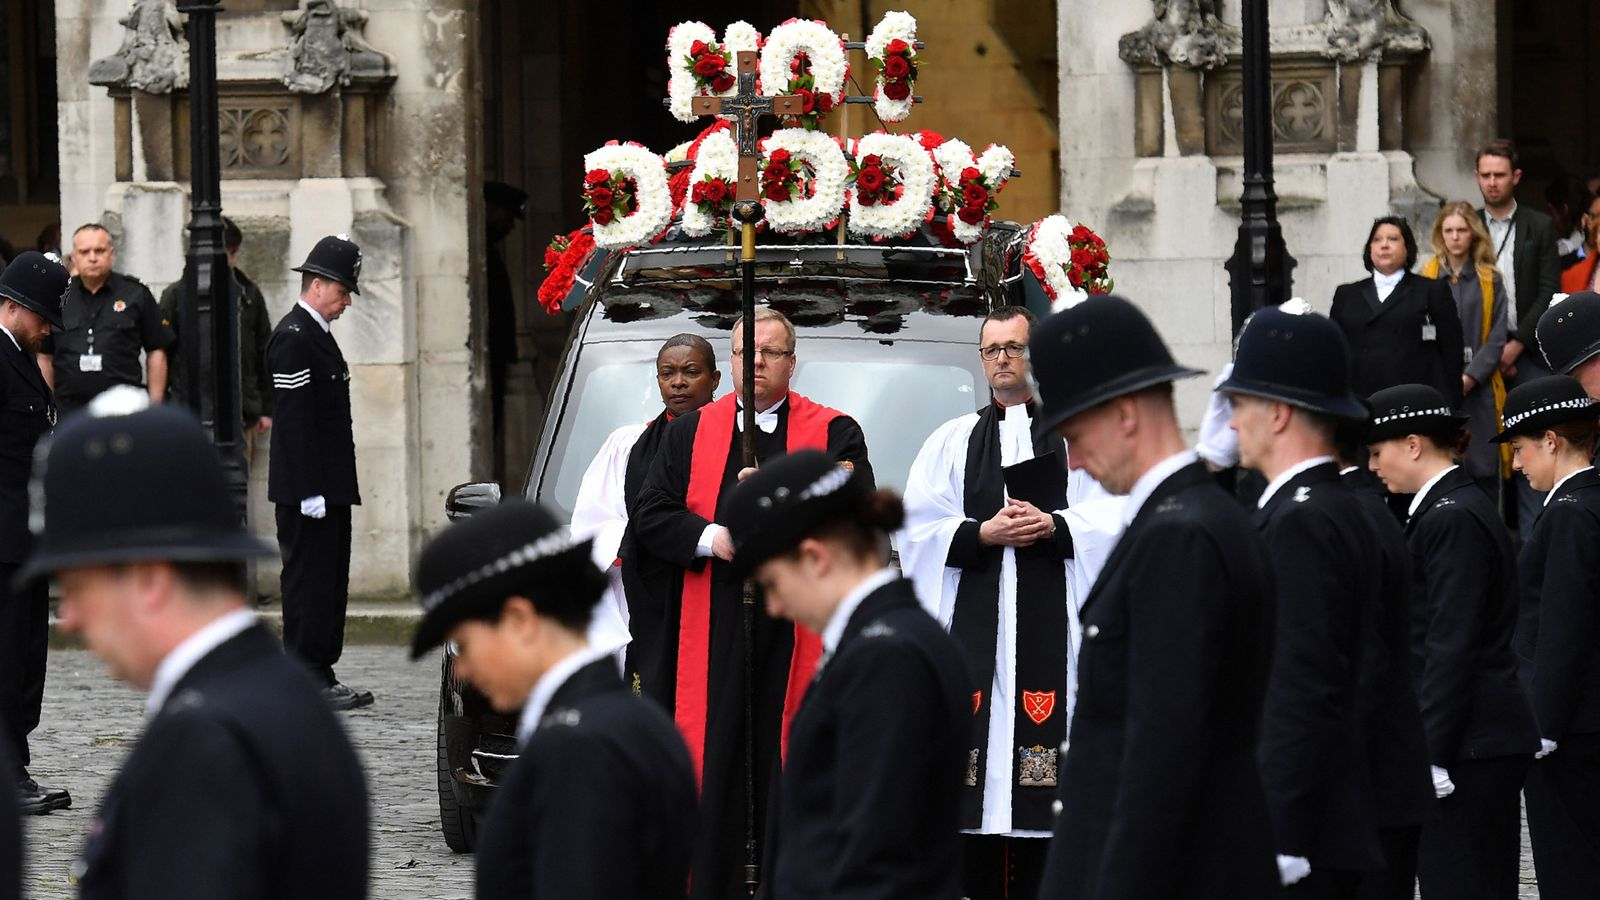 'No 1 Daddy': Final farewell to hero PC Palmer